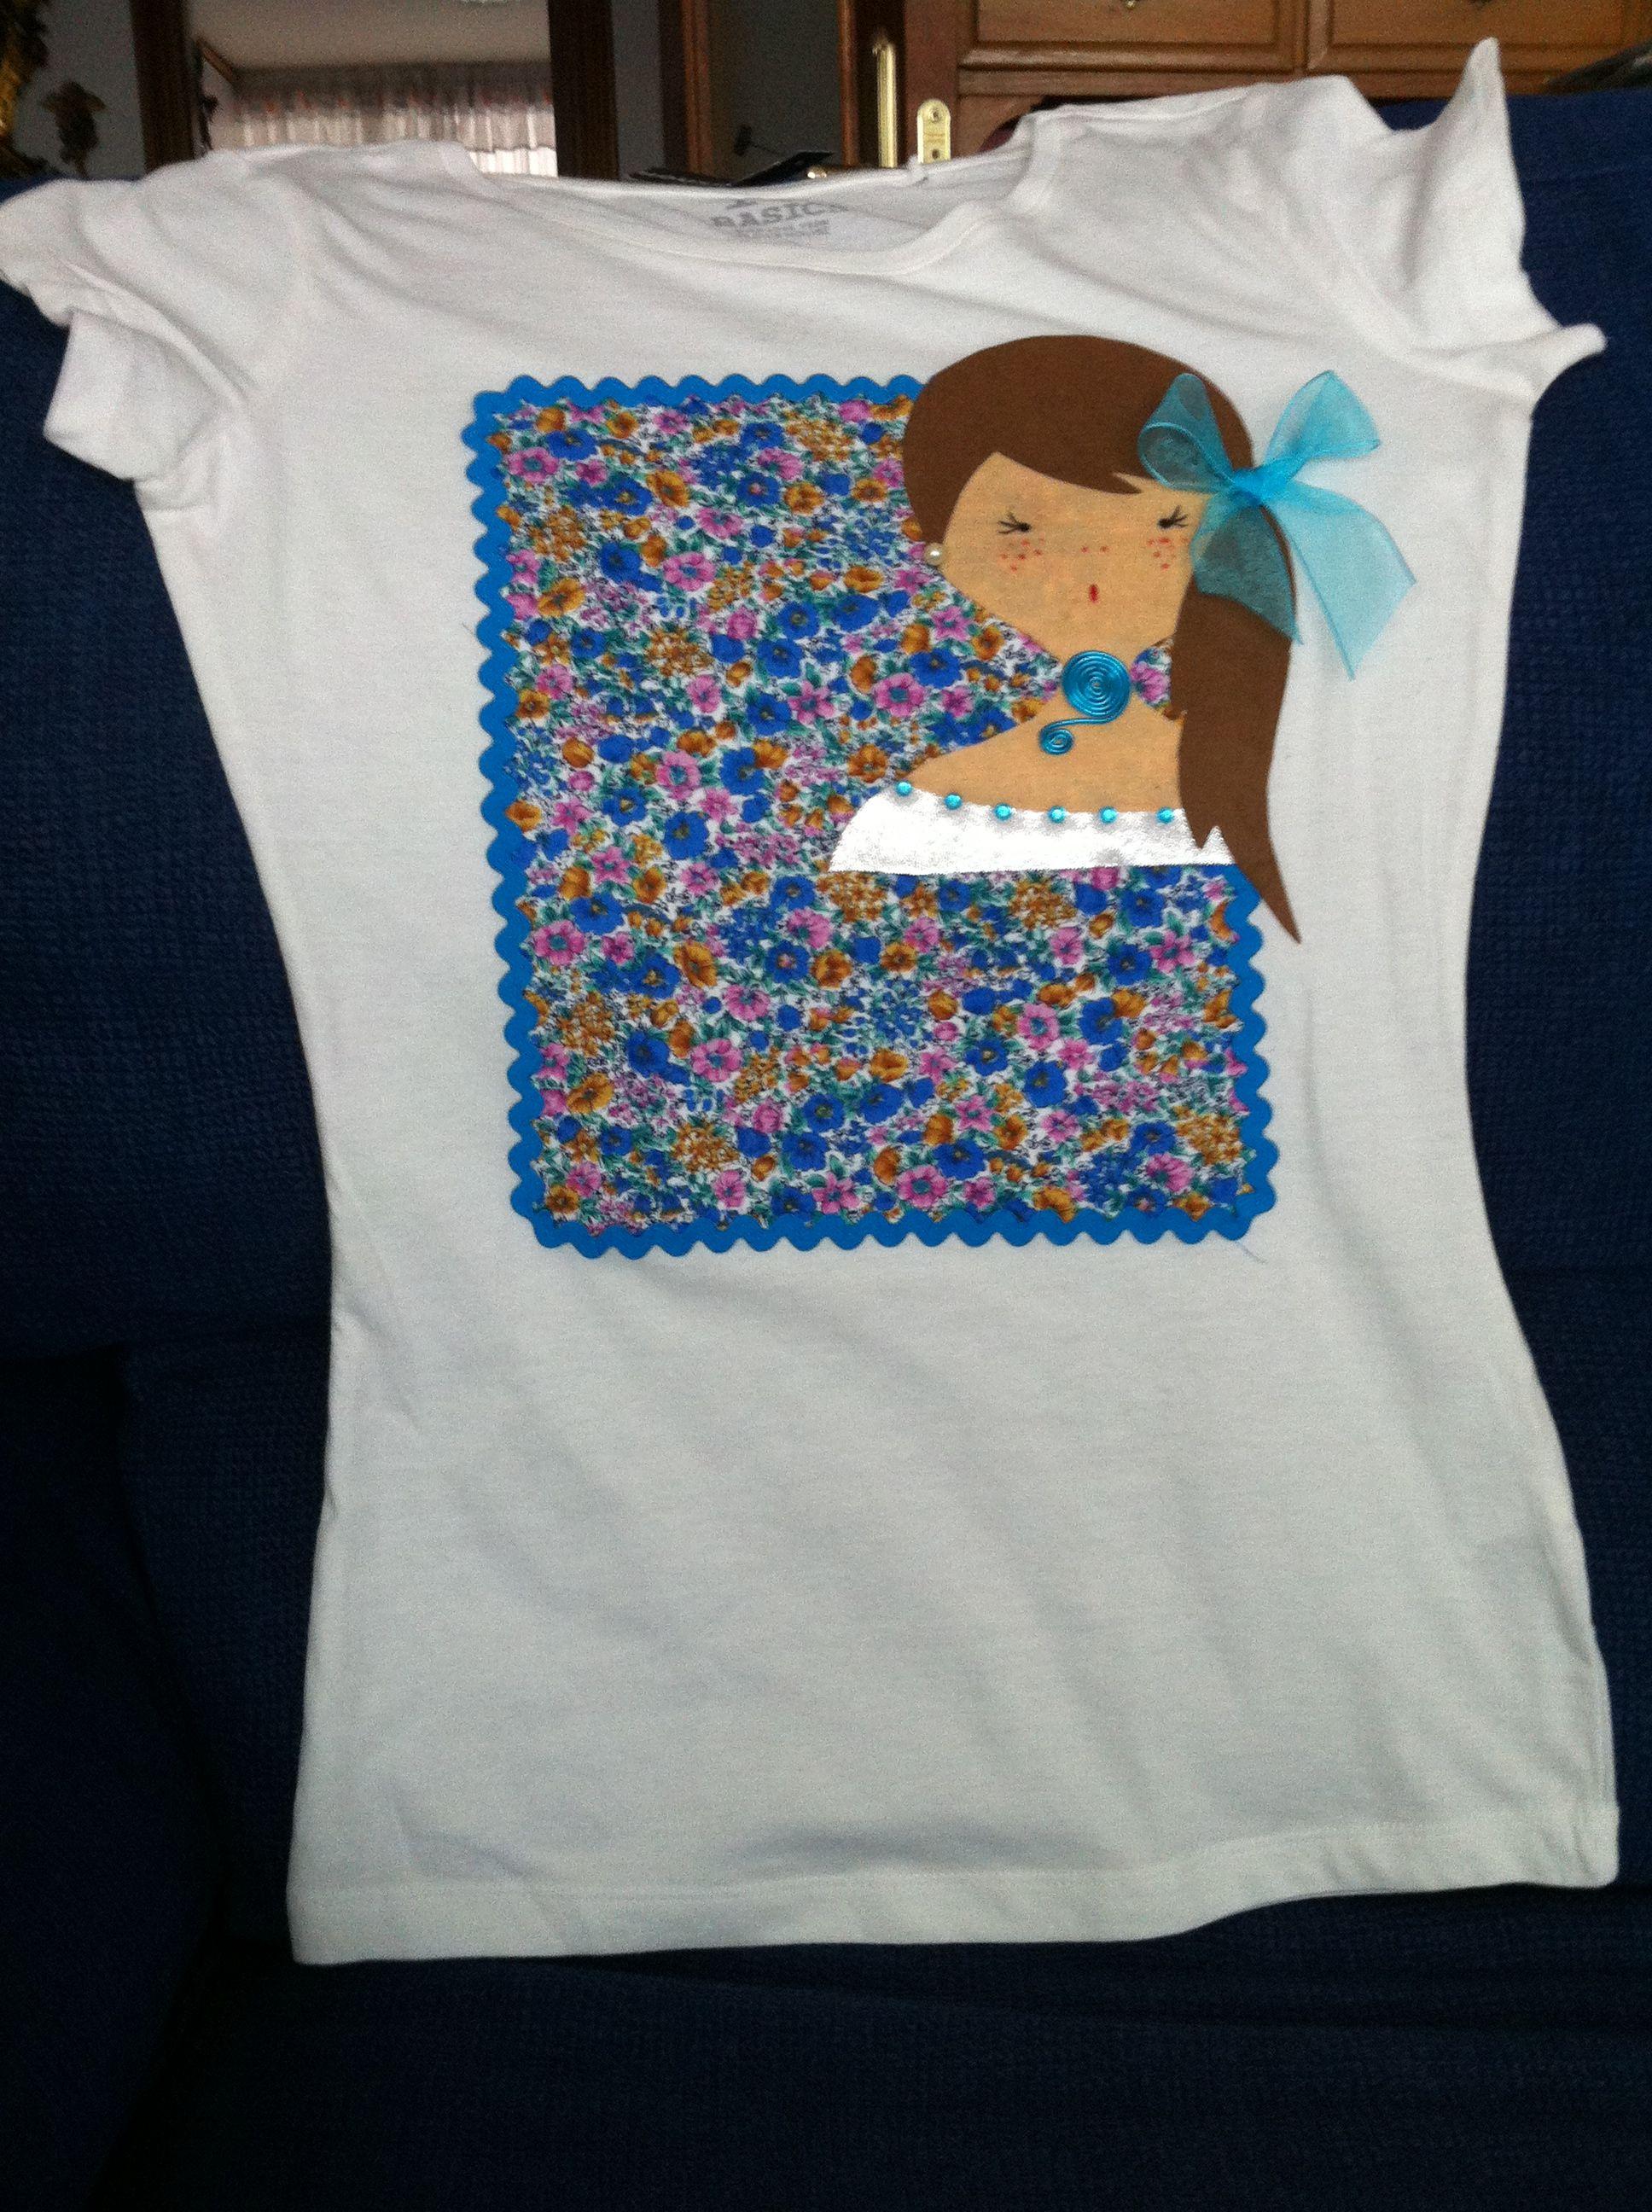 Camiseta con una muñeca con coleta al lado